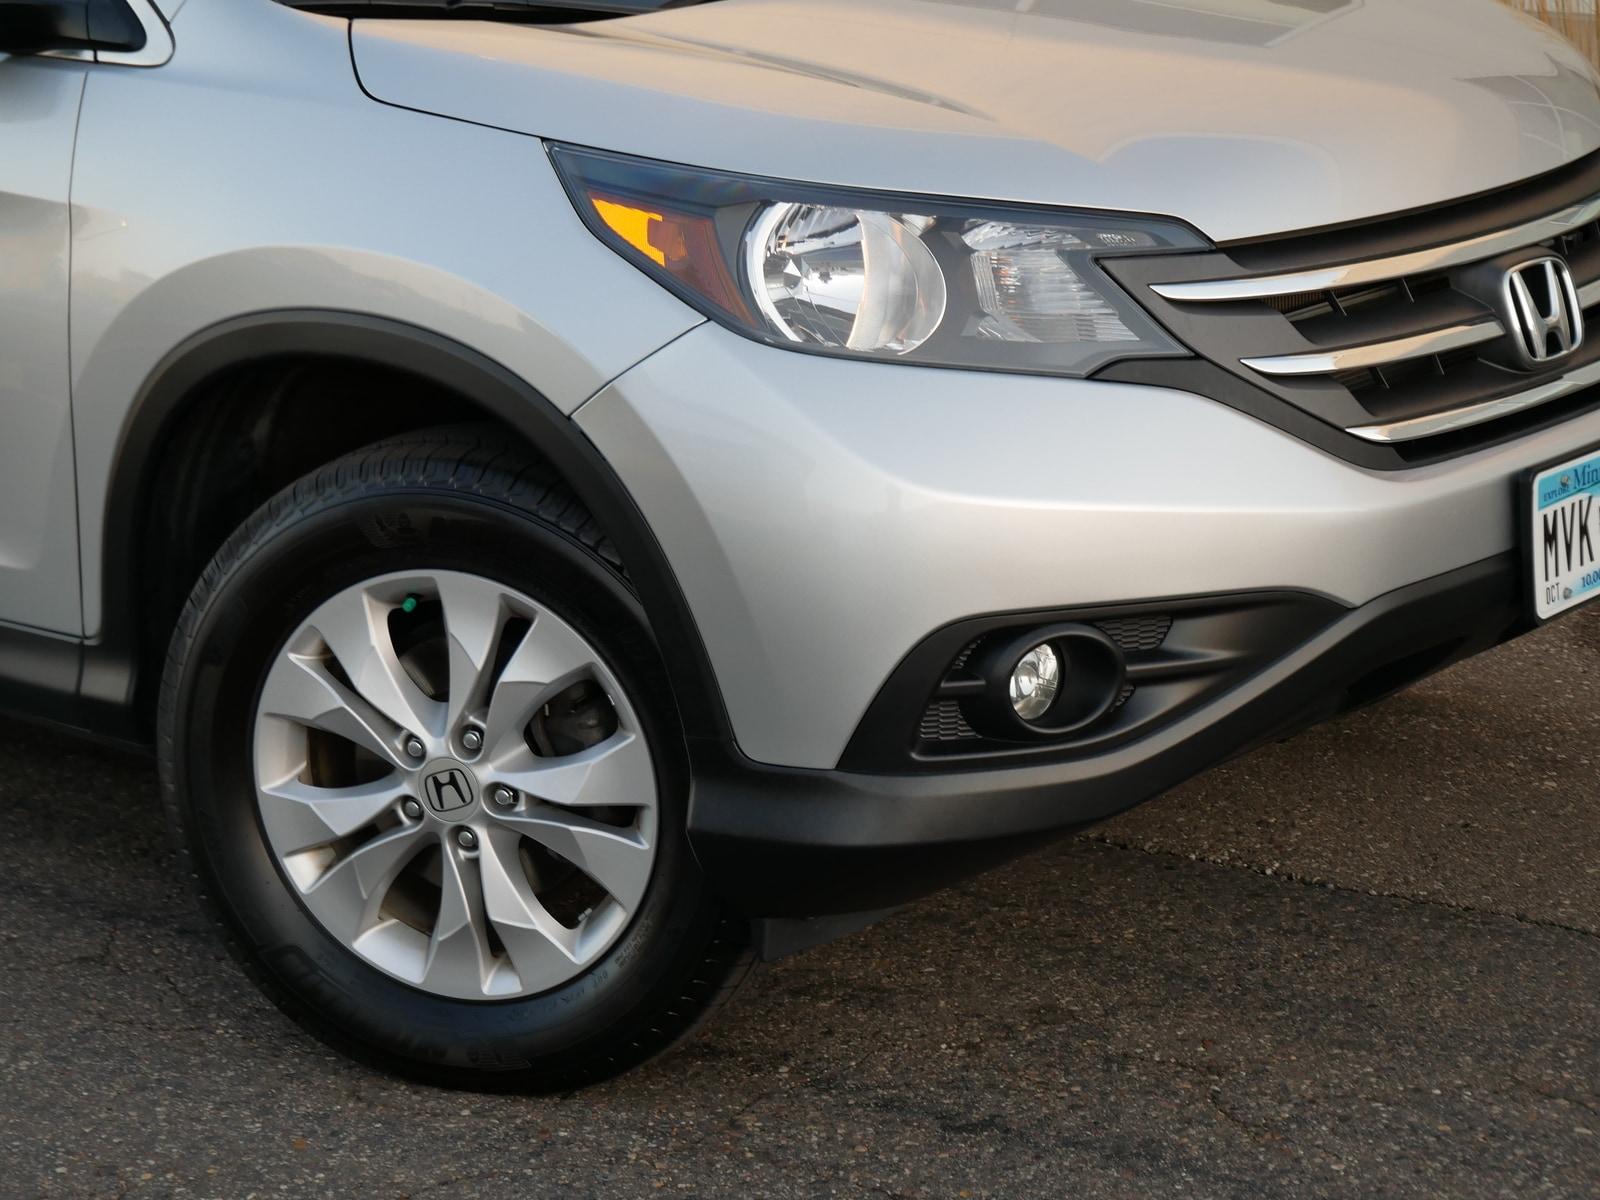 Used 2014 Honda CR-V EX-L with VIN 2HKRM4H71EH627160 for sale in Saint Paul, Minnesota